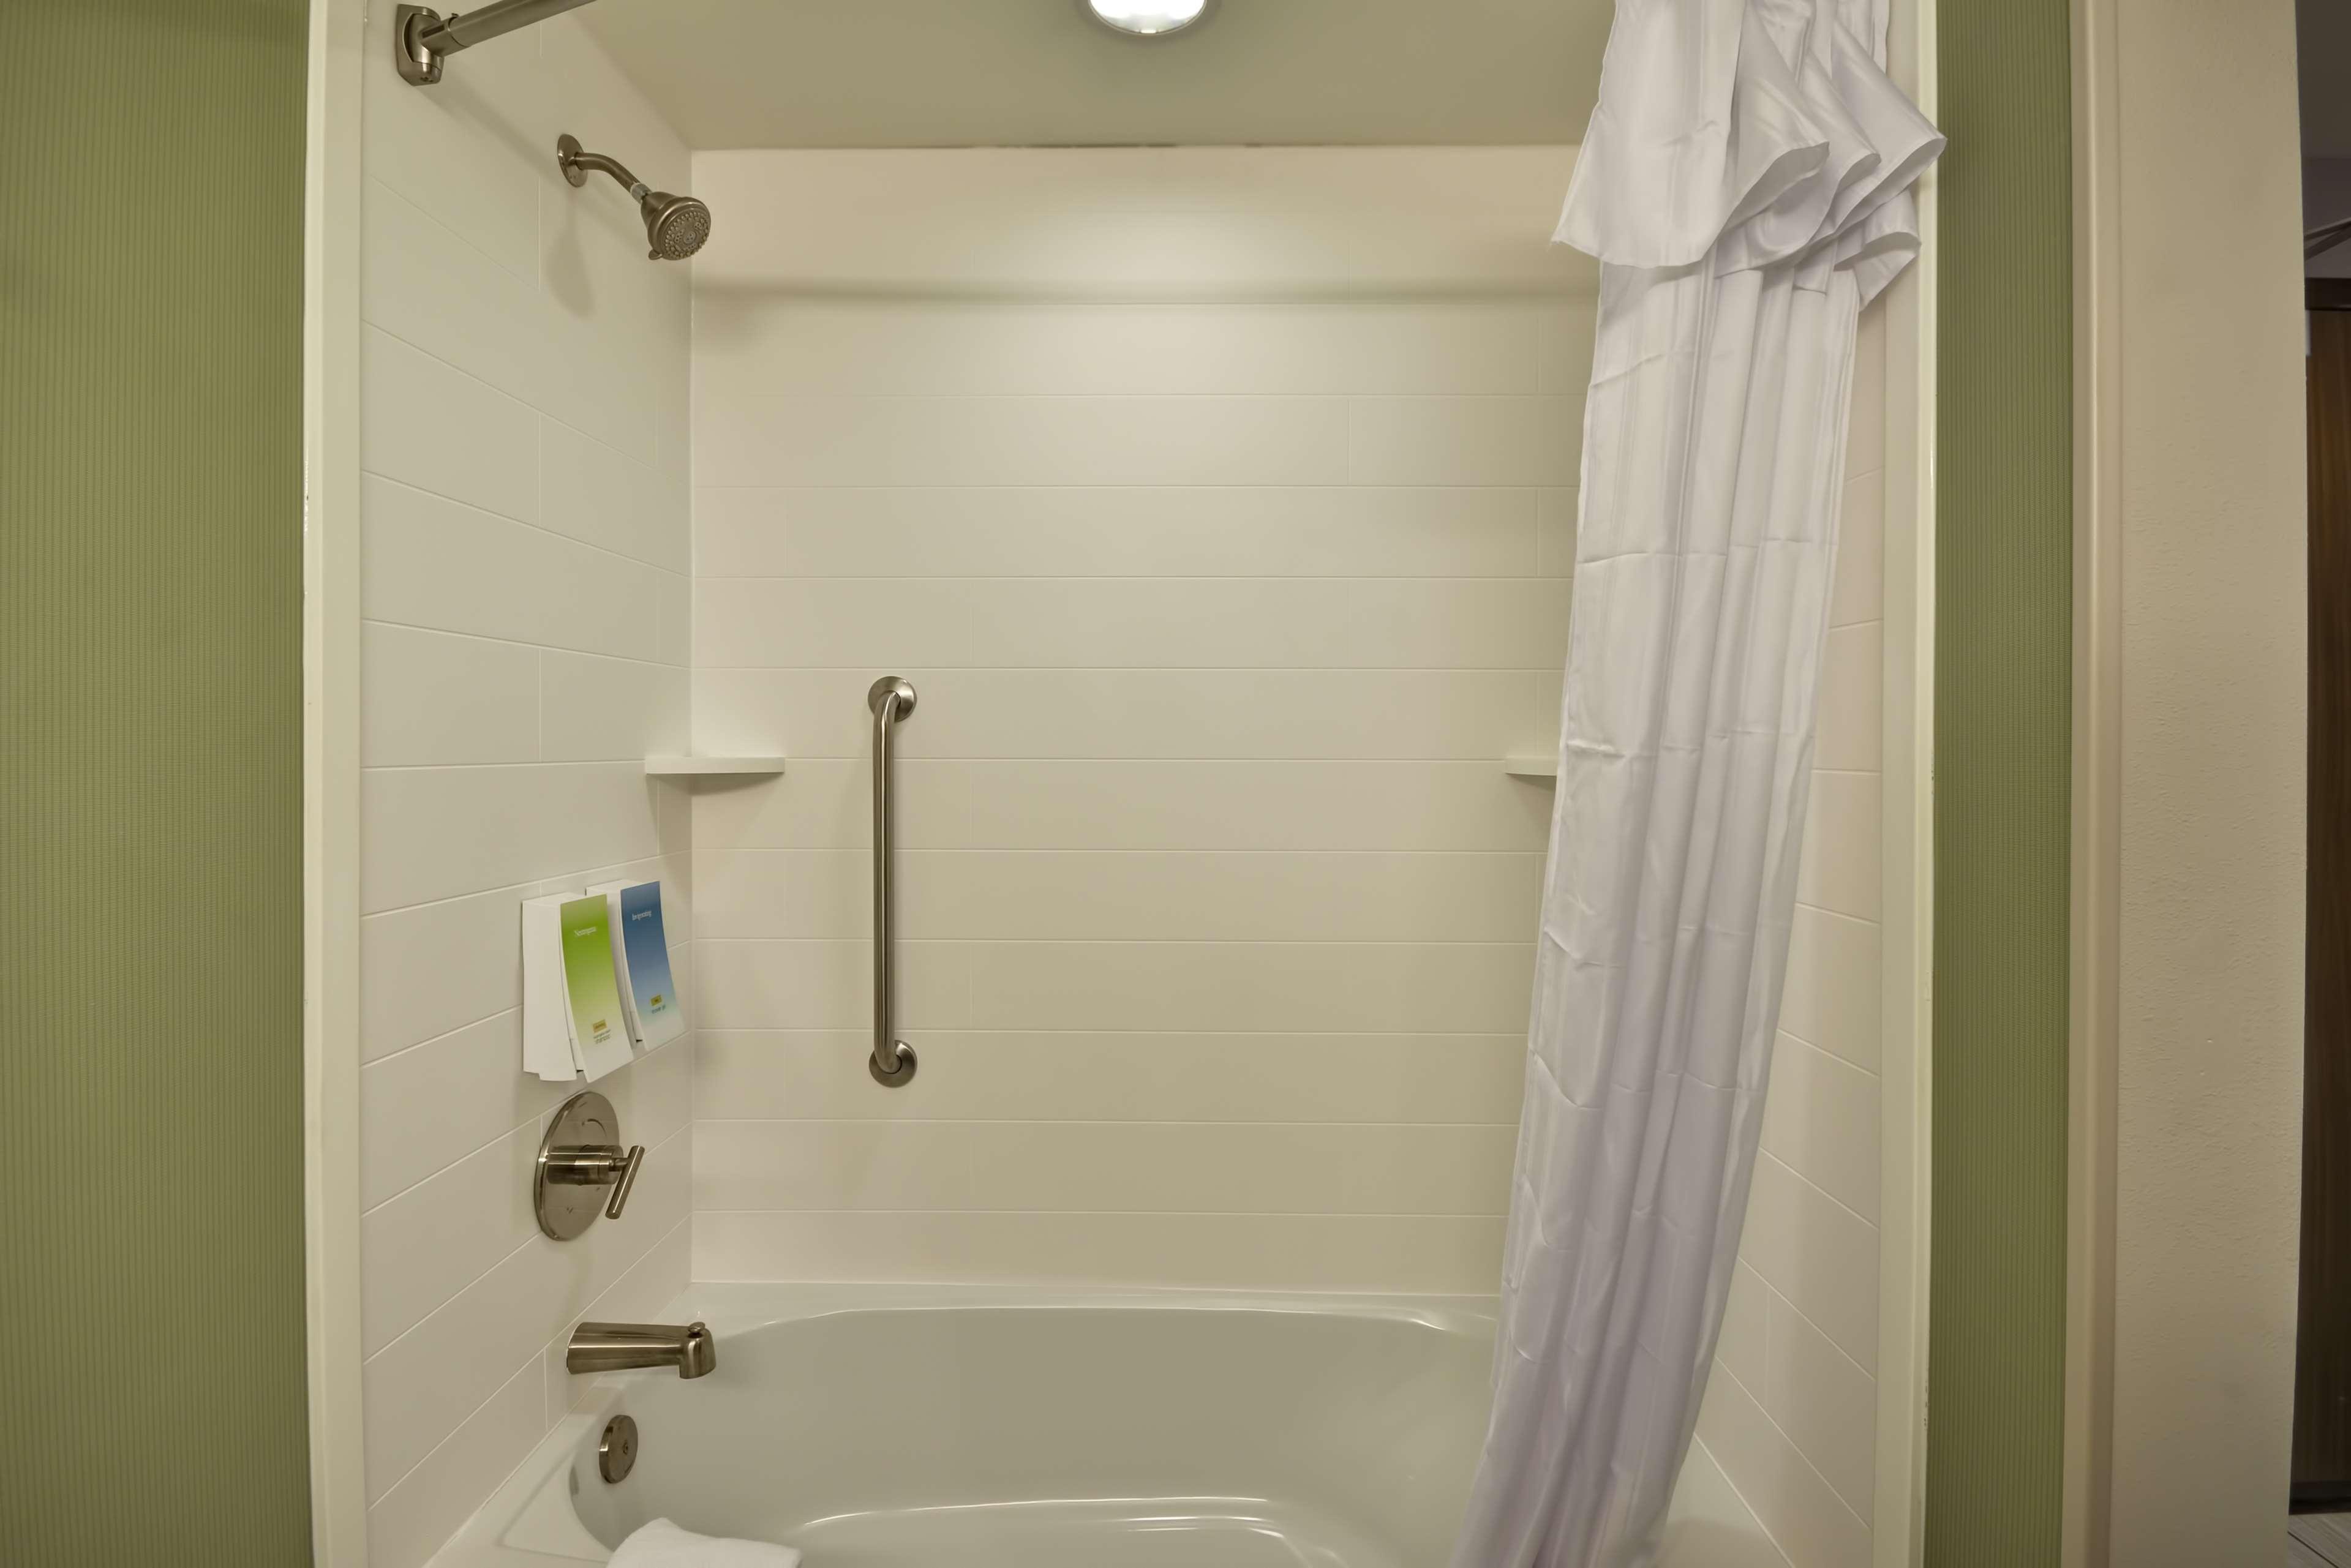 Home2 Suites by Hilton  St. Simons Island image 42